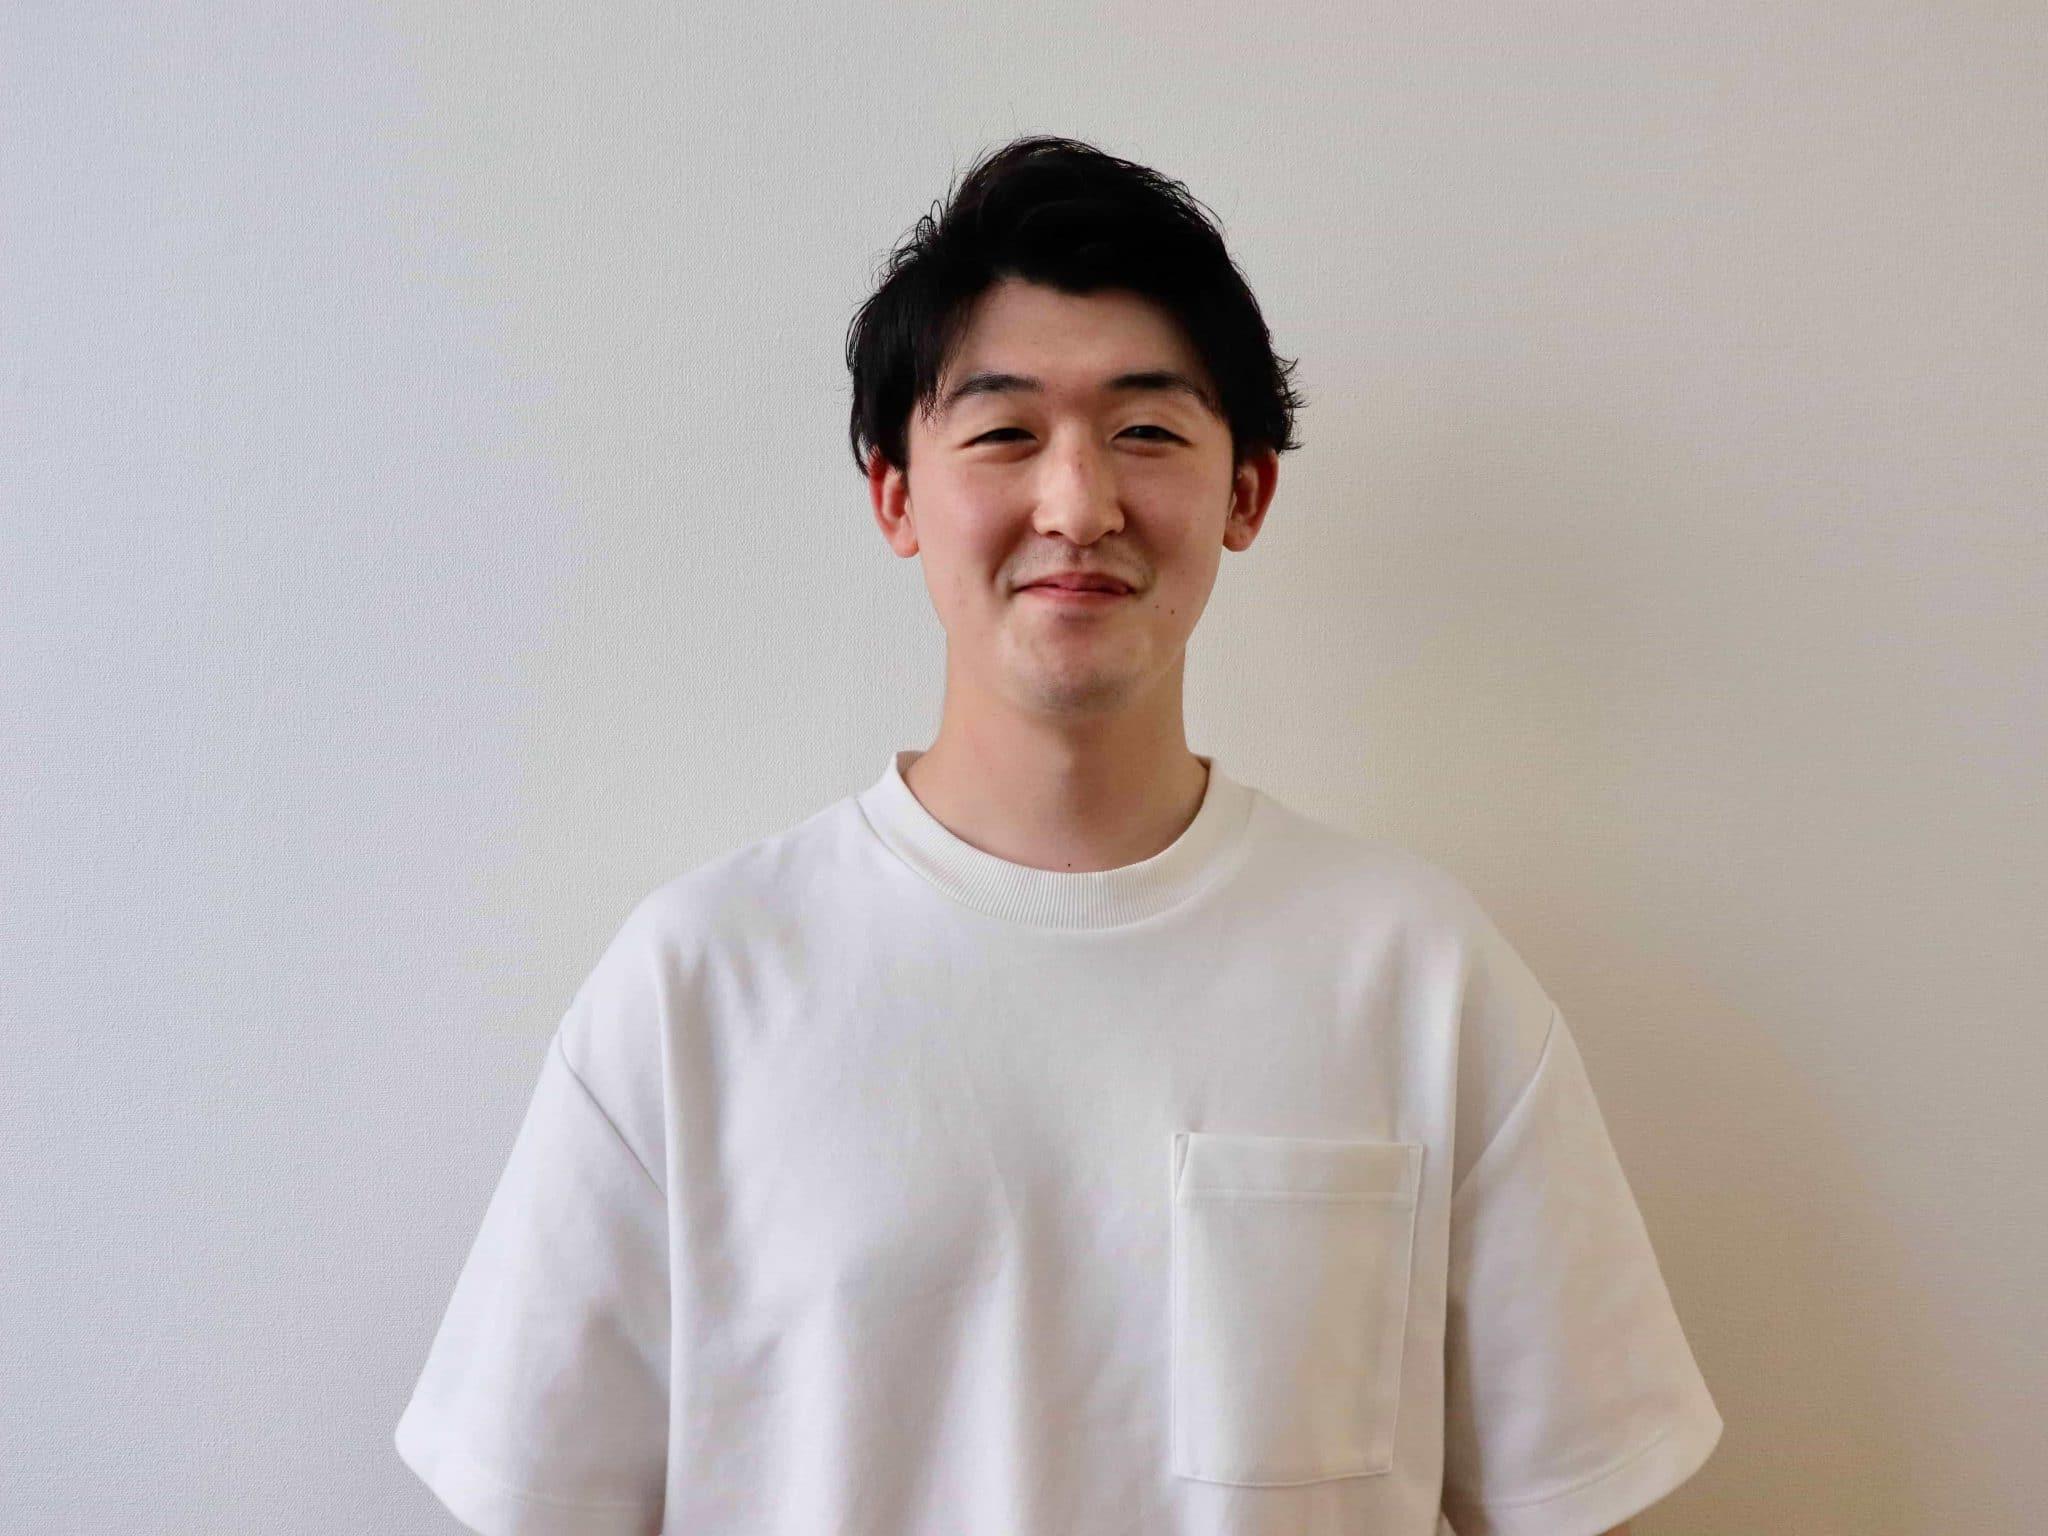 Masahiro Kochi